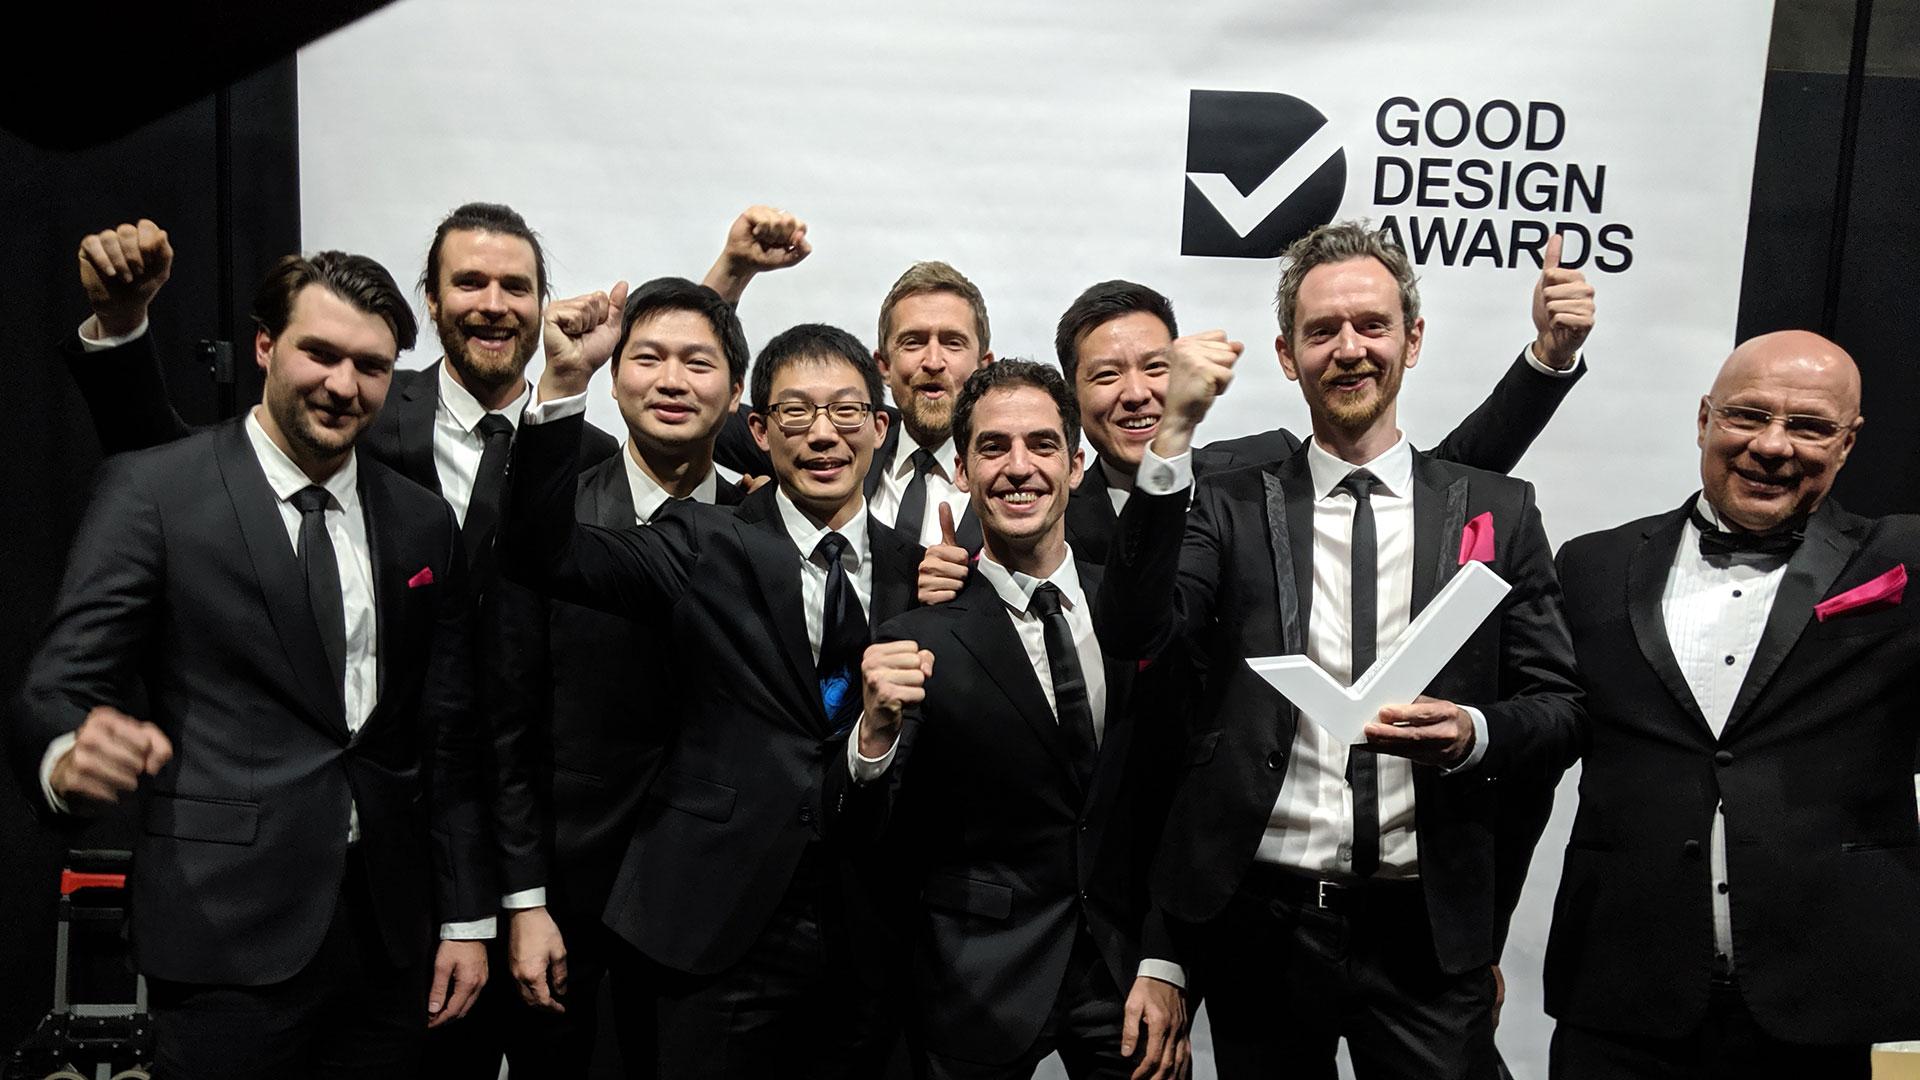 Good-Design-2019-Gallery-01.jpg